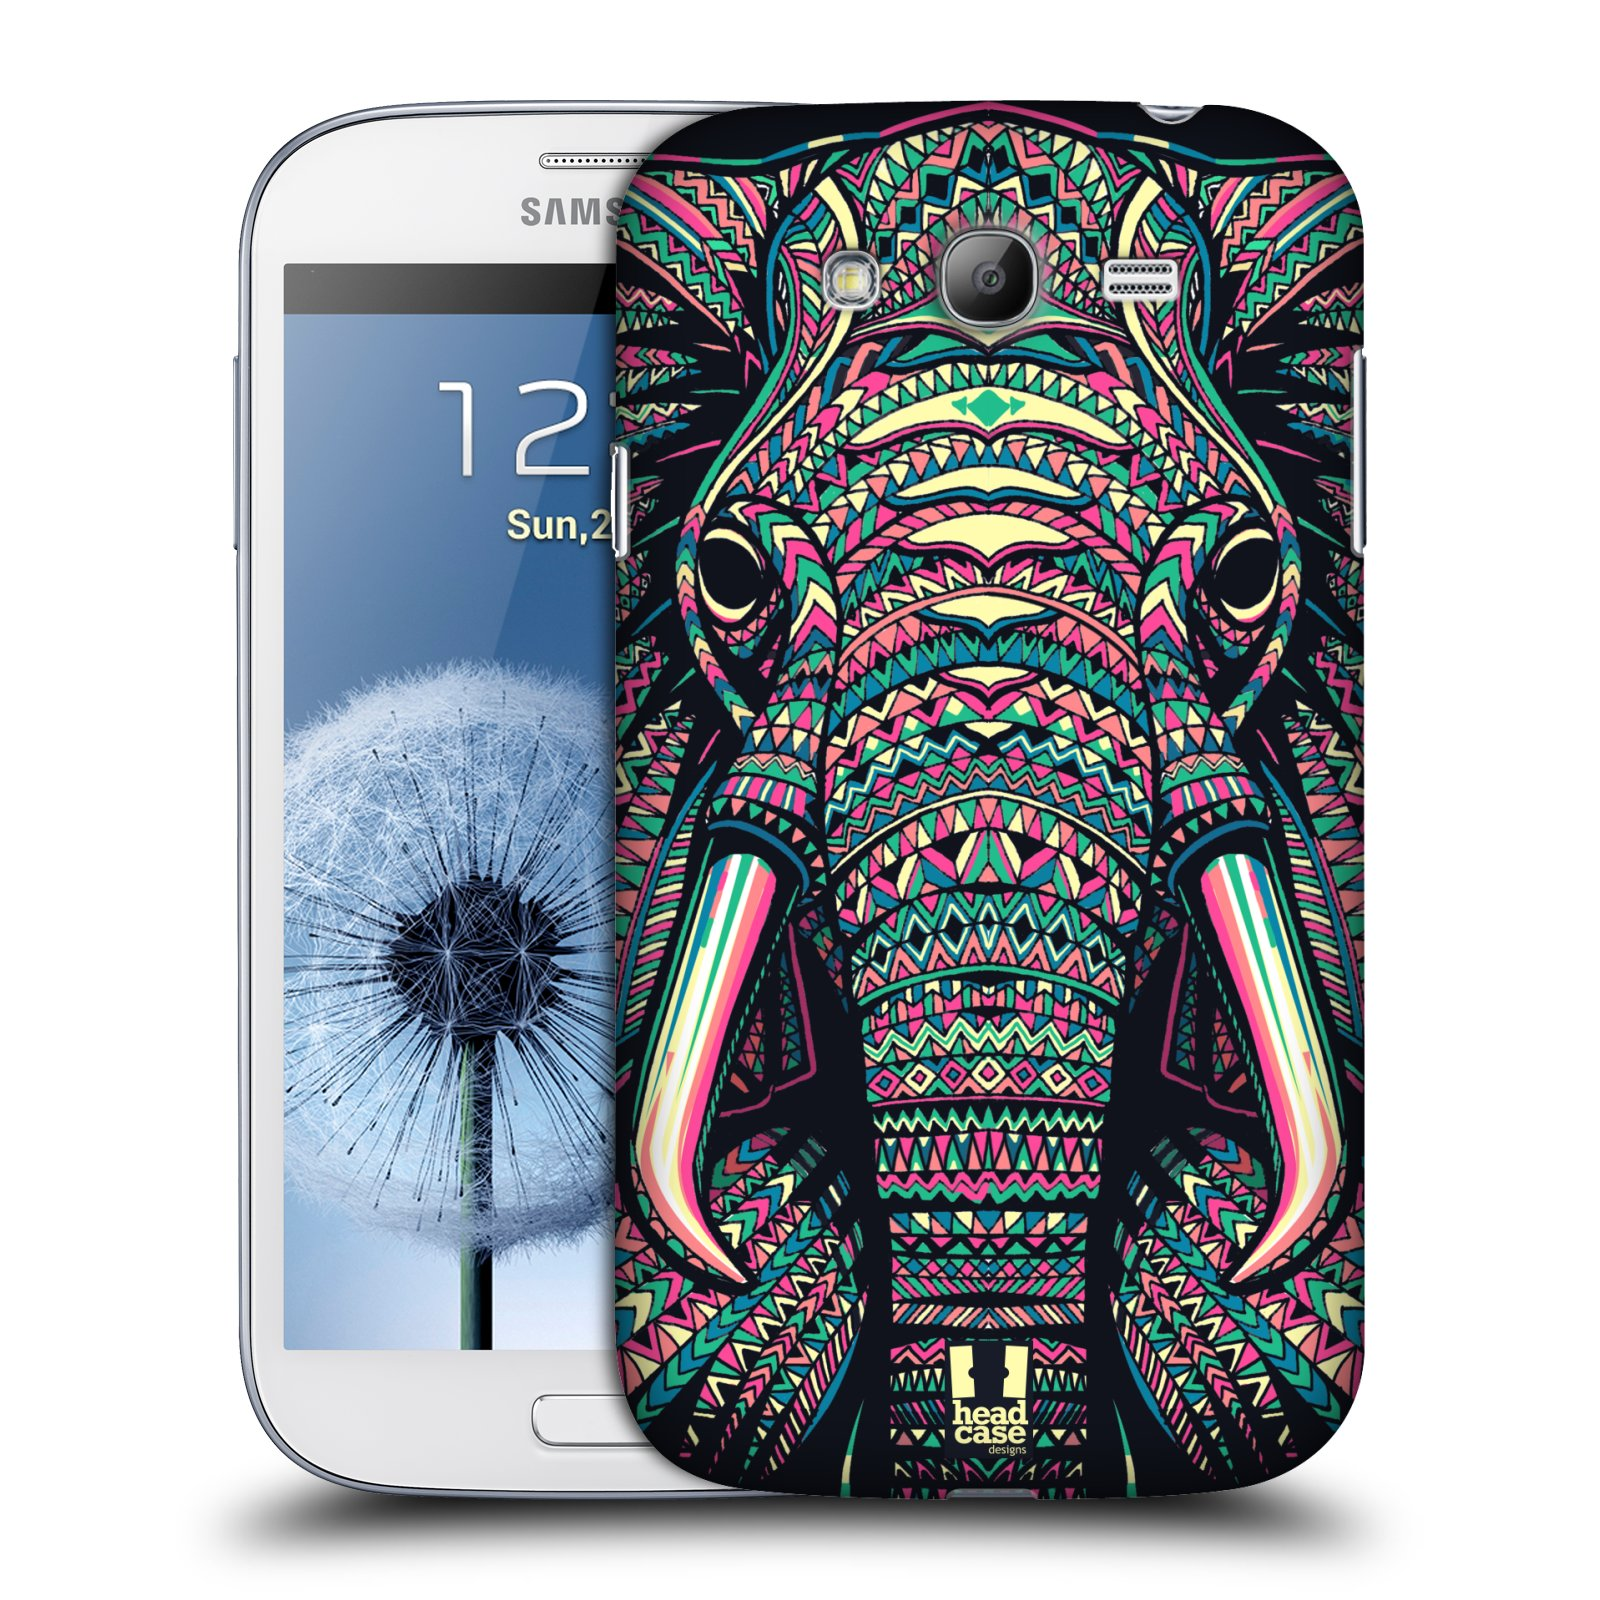 HEAD CASE plastový obal na mobil SAMSUNG GALAXY Grand i9080 vzor Aztécký motiv zvíře 2 slon